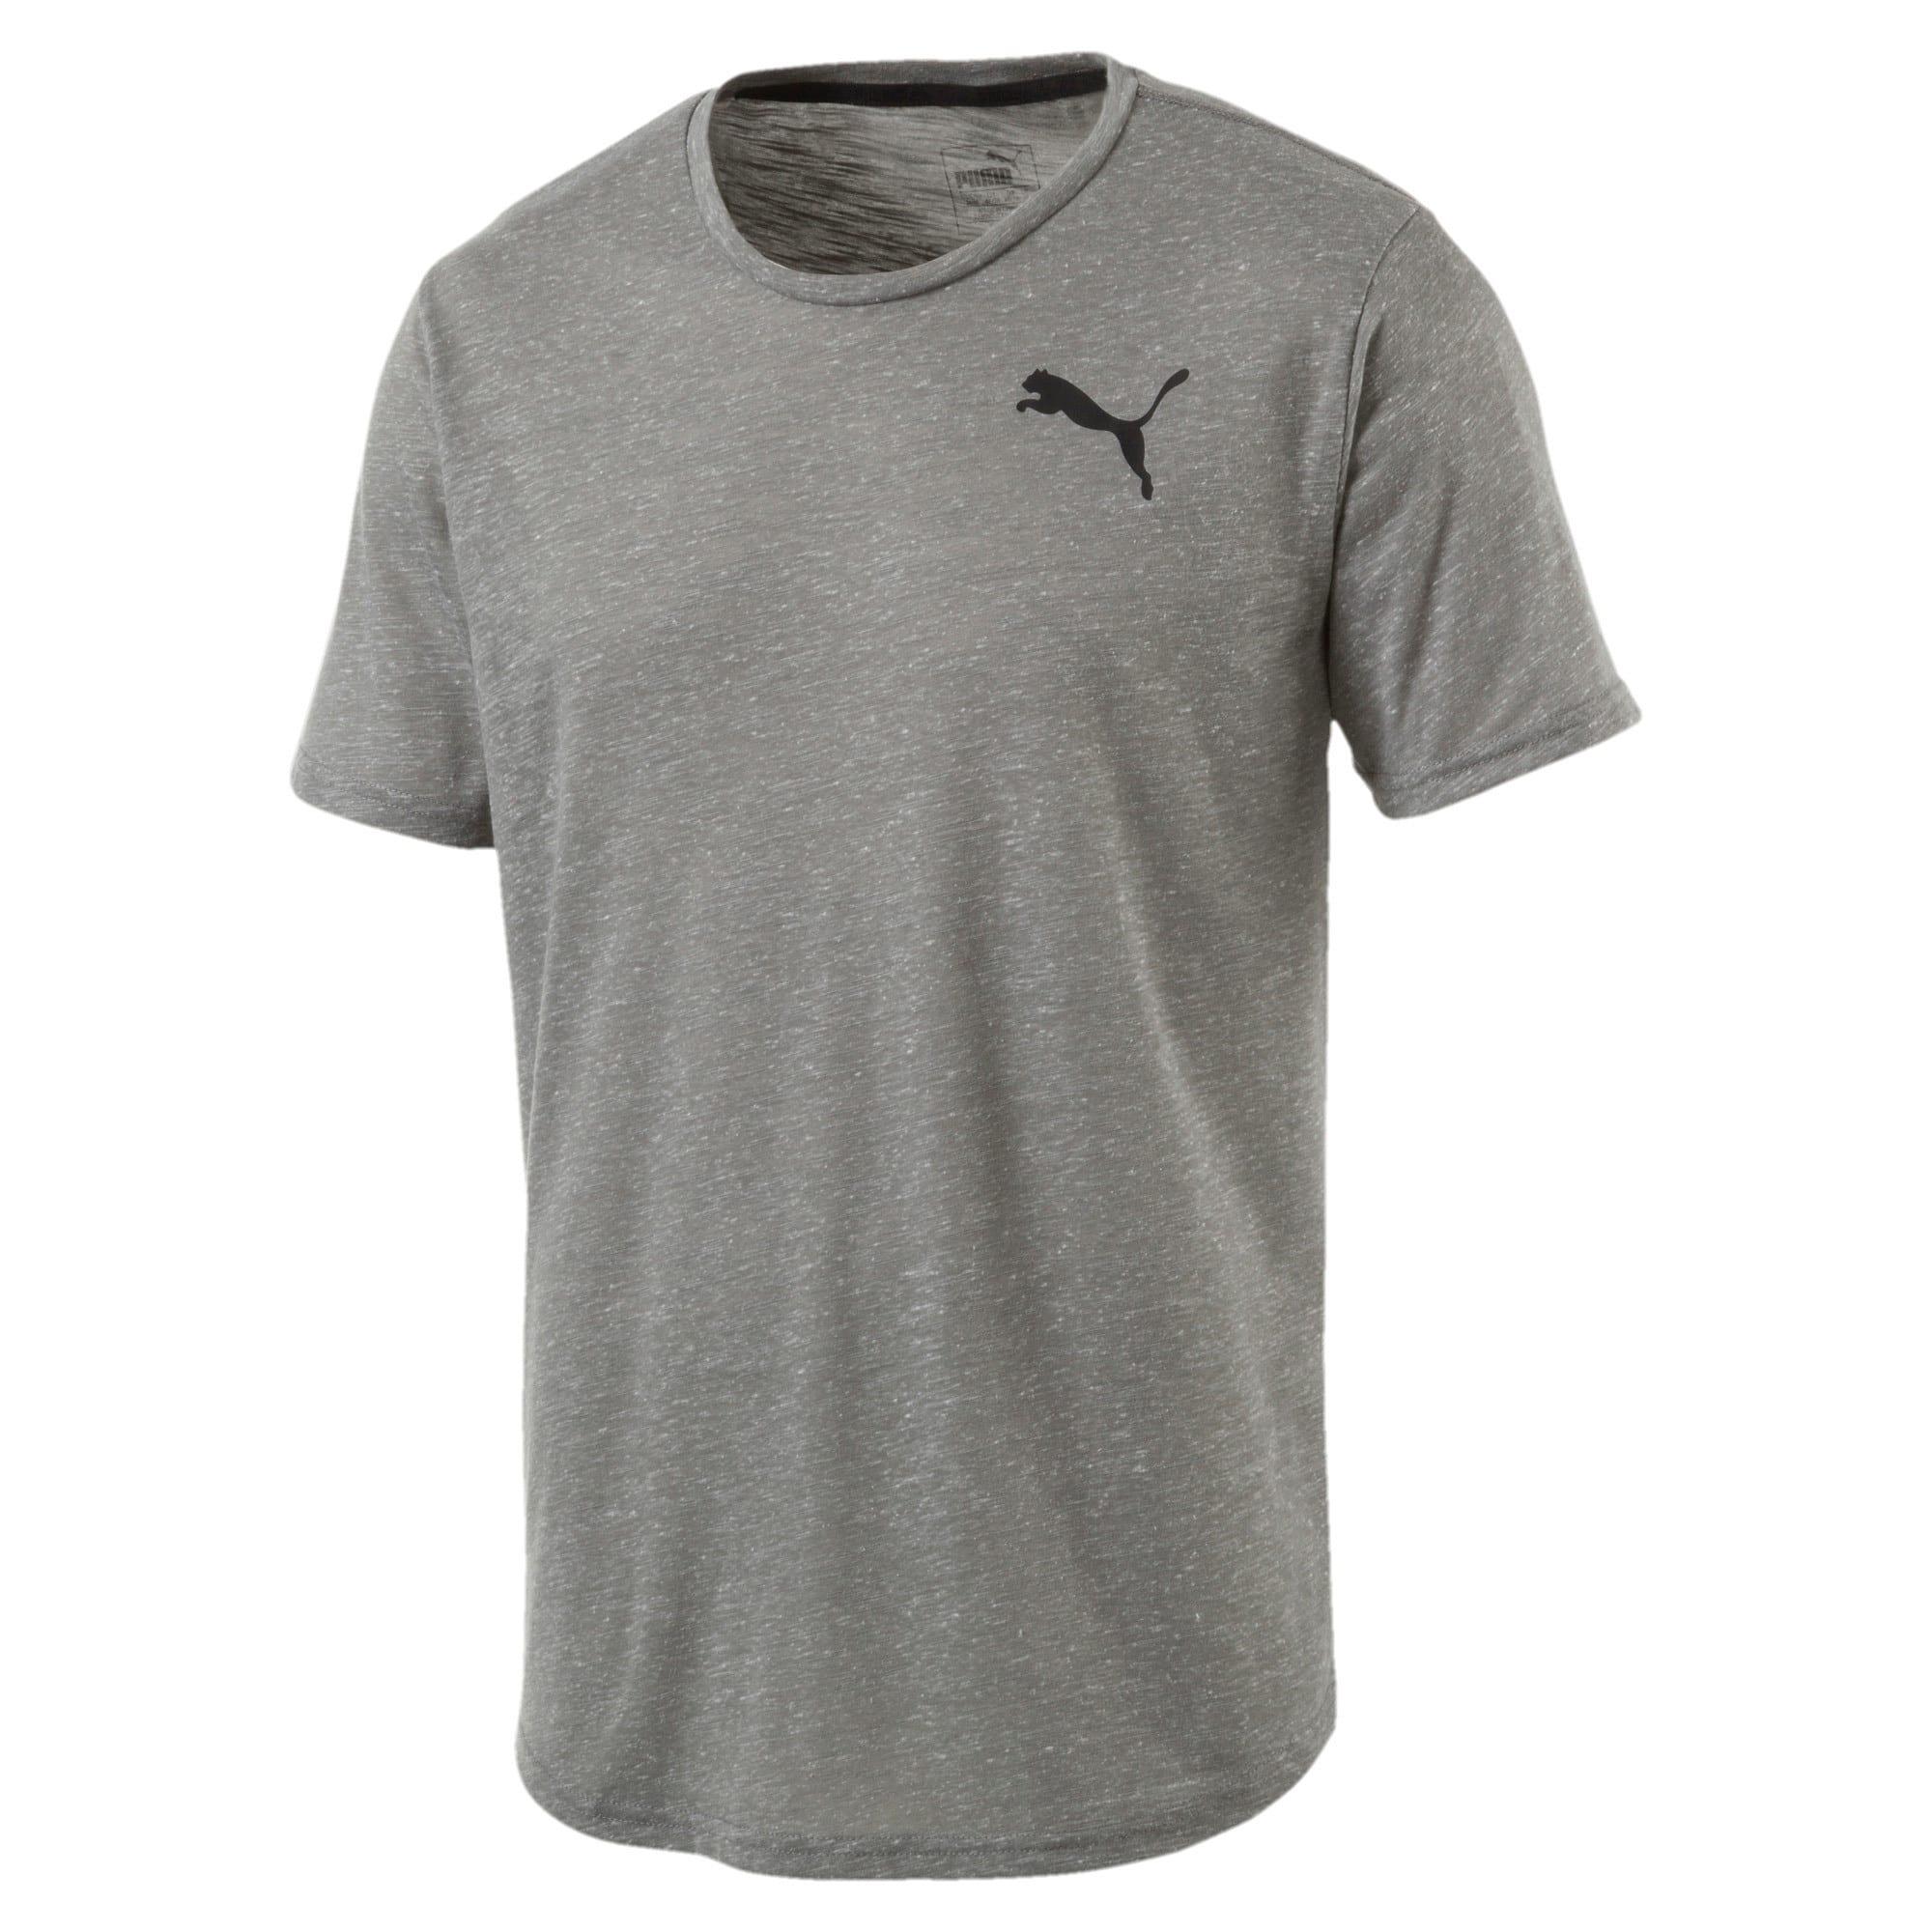 Thumbnail 4 of Active Training Men's Dri-Release® Novelty T-Shirt, Medium Gray Heather, medium-IND